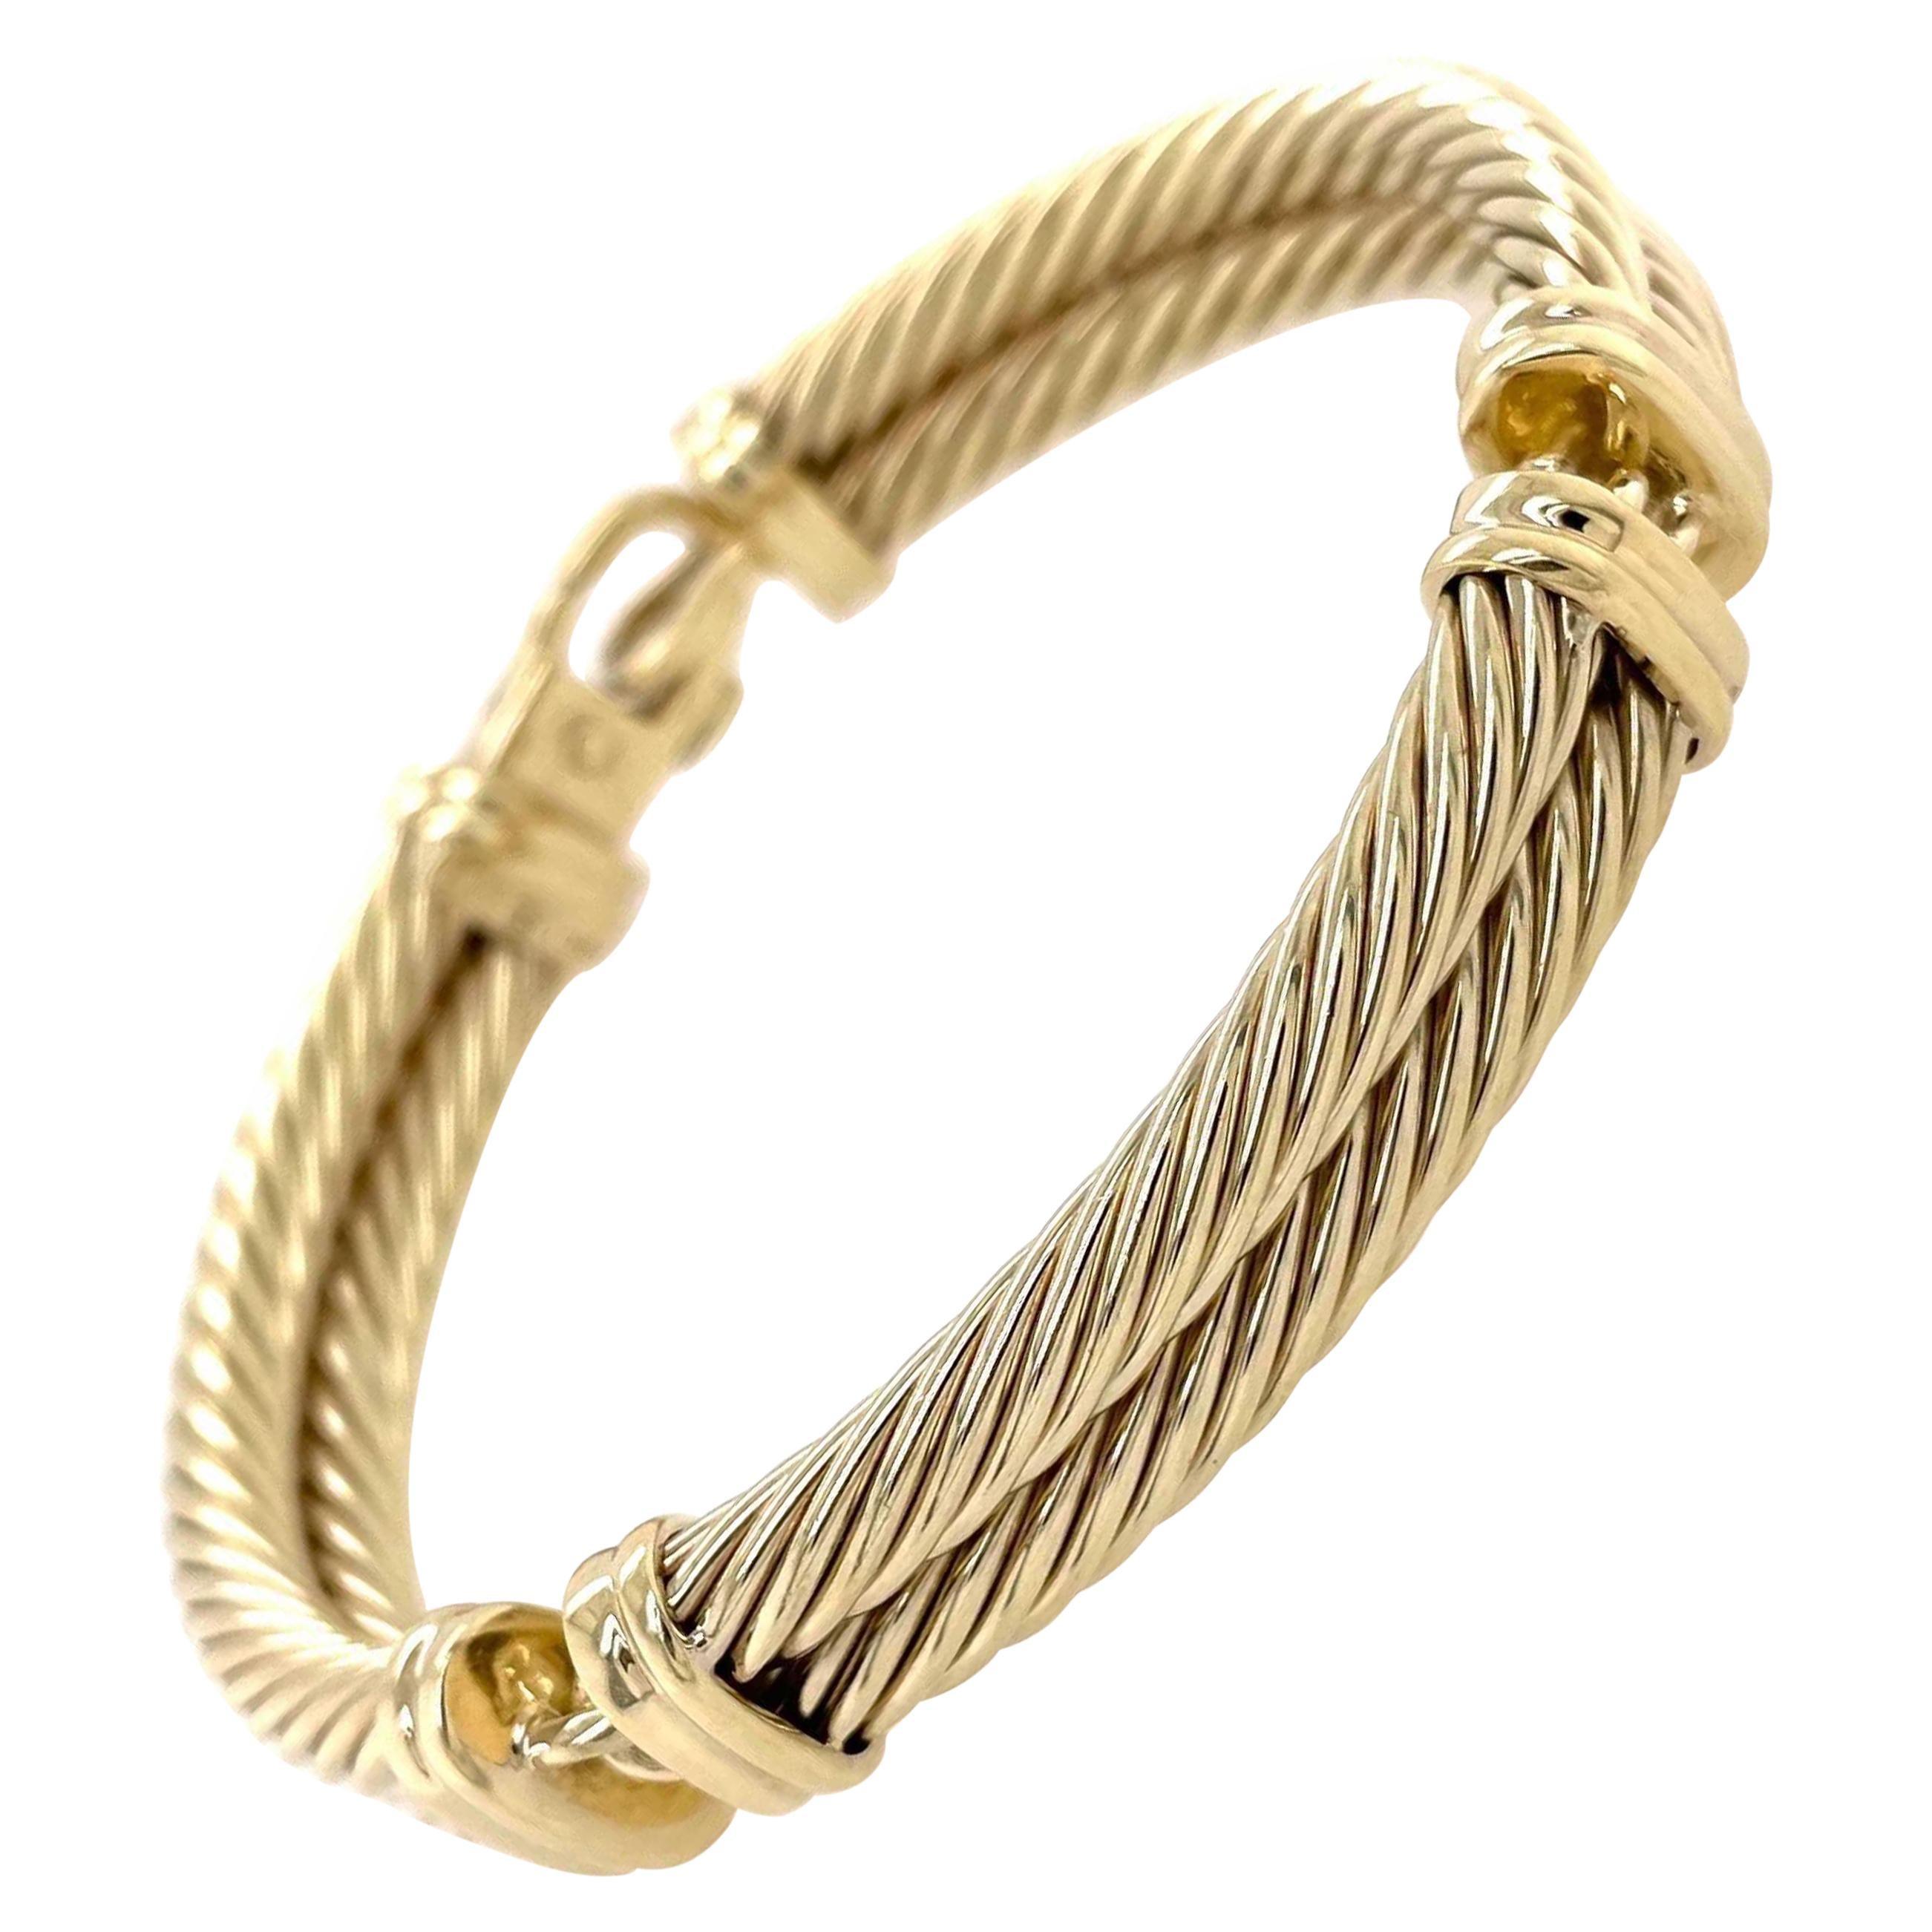 David Yurman 14 Karat Yellow Gold Bracelet